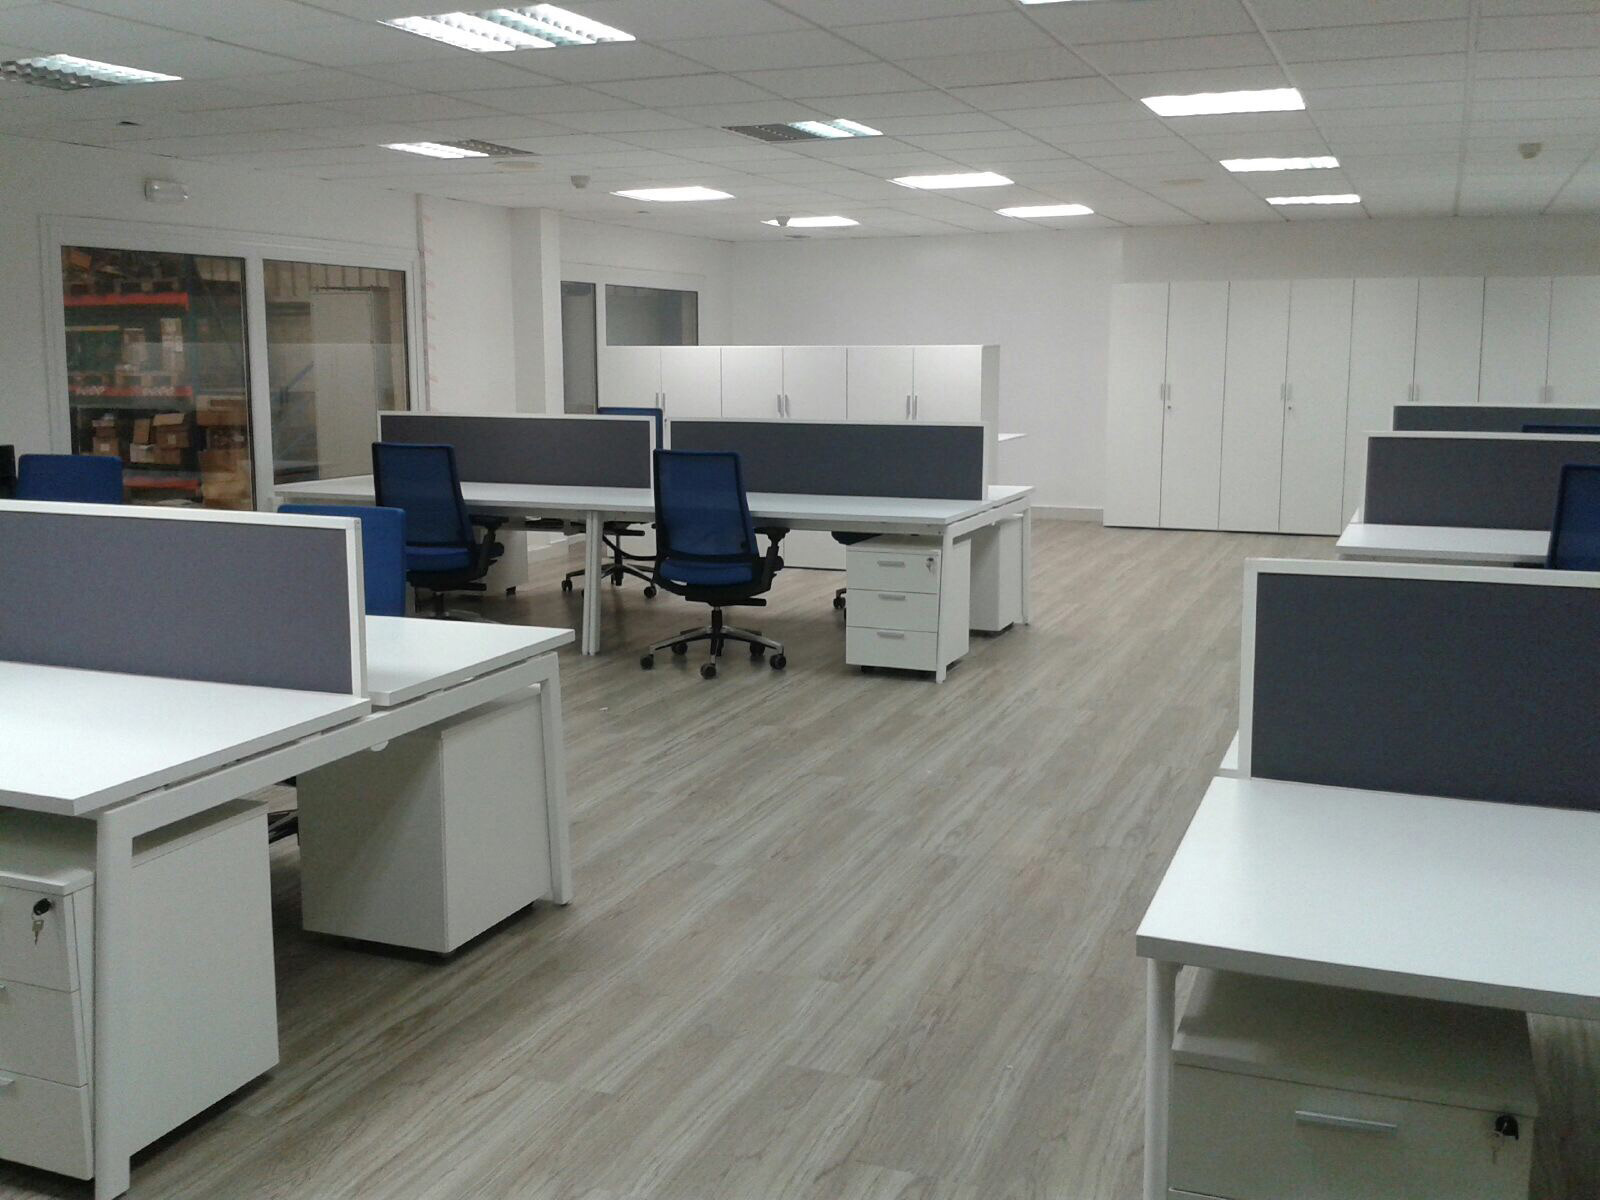 sillleria oficina, mobiliario bilbao, interiorismo oficinas bilbao